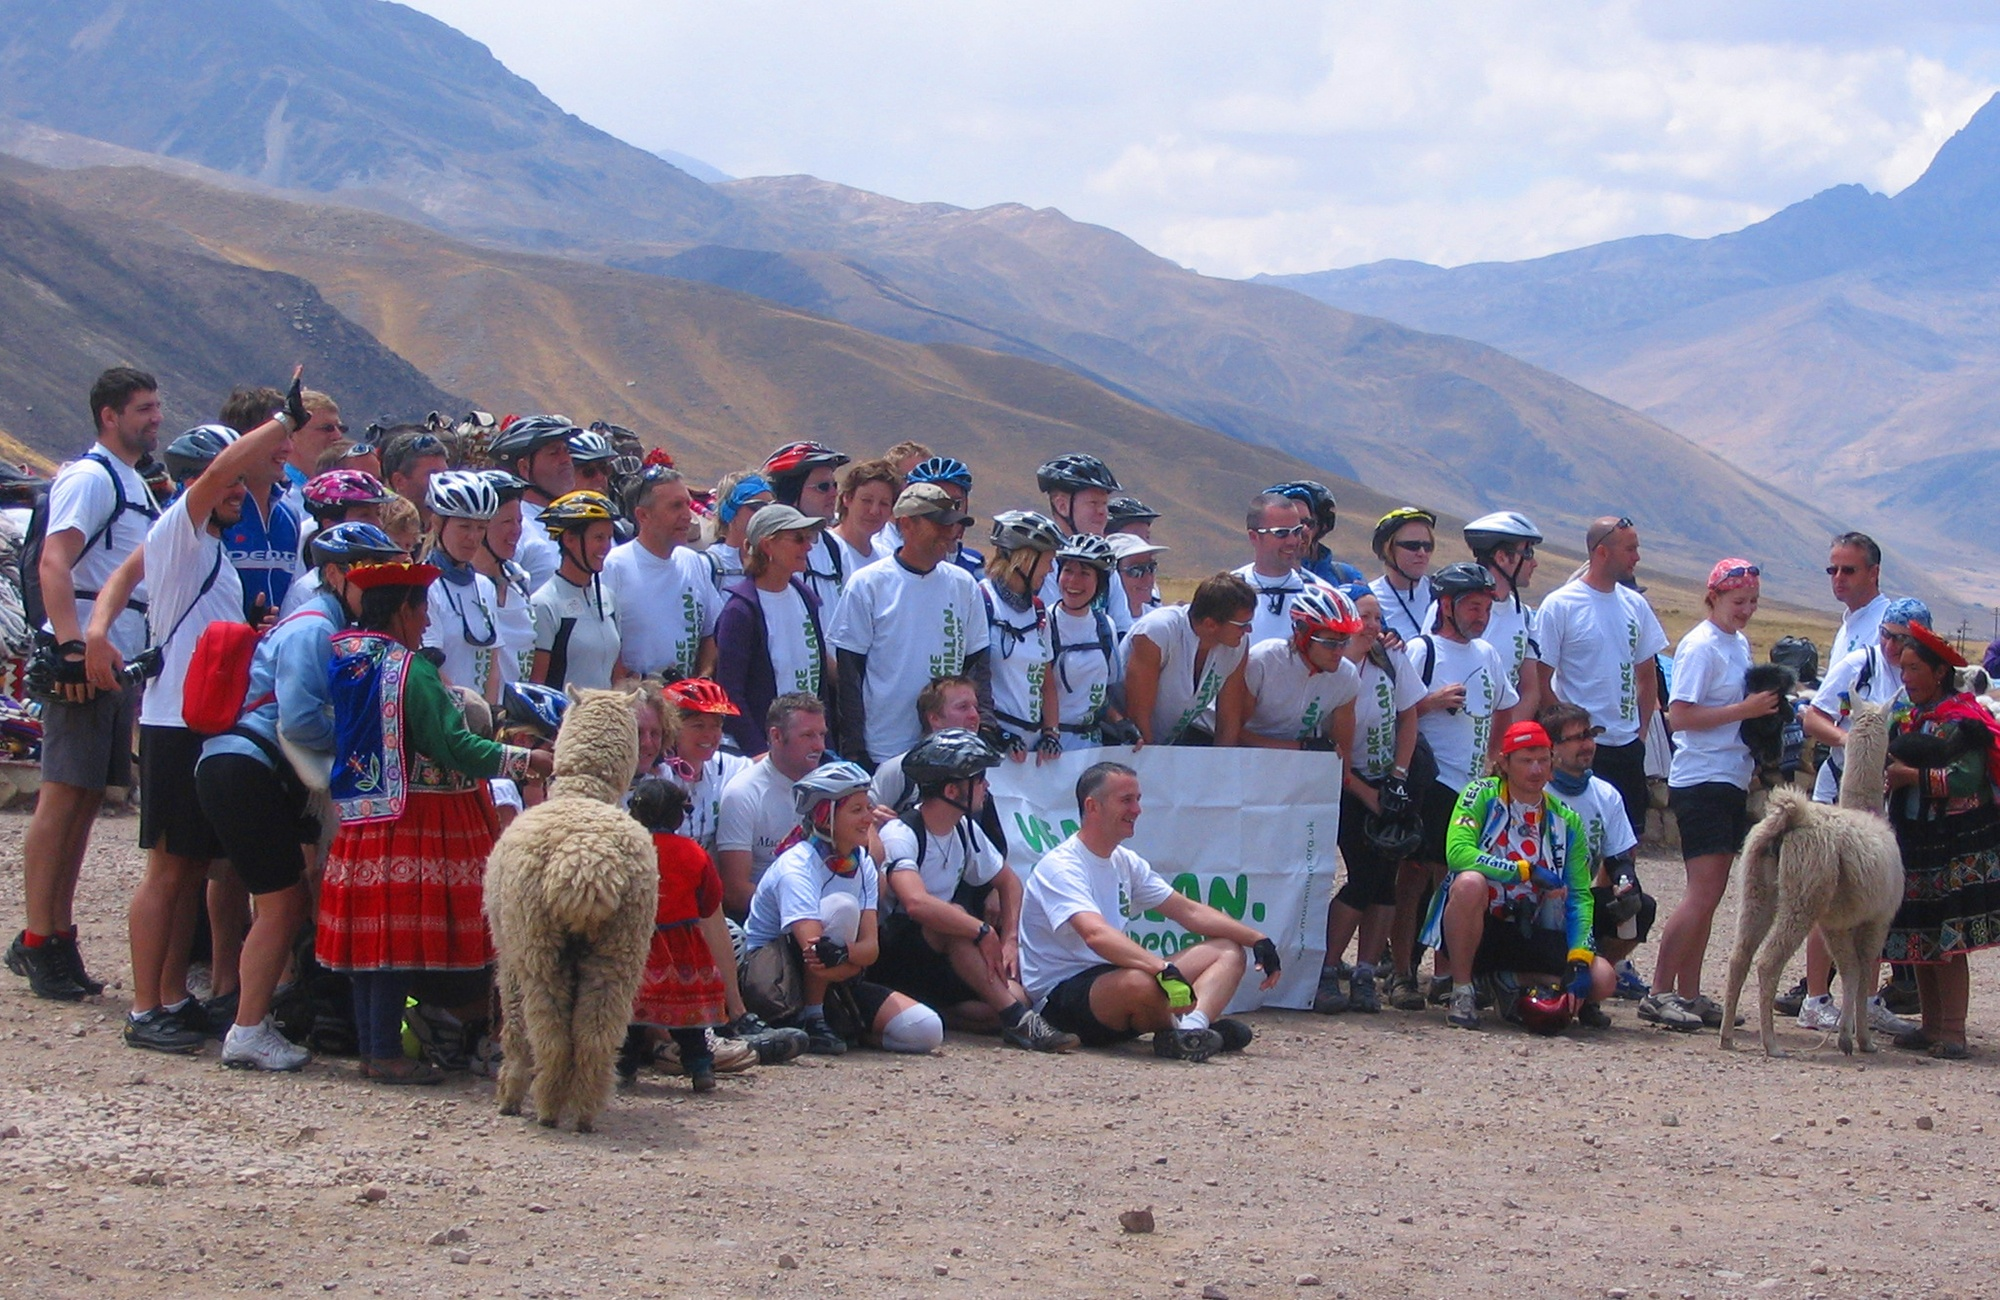 Macmillan_Charity_Cyclists_Peri.jpg